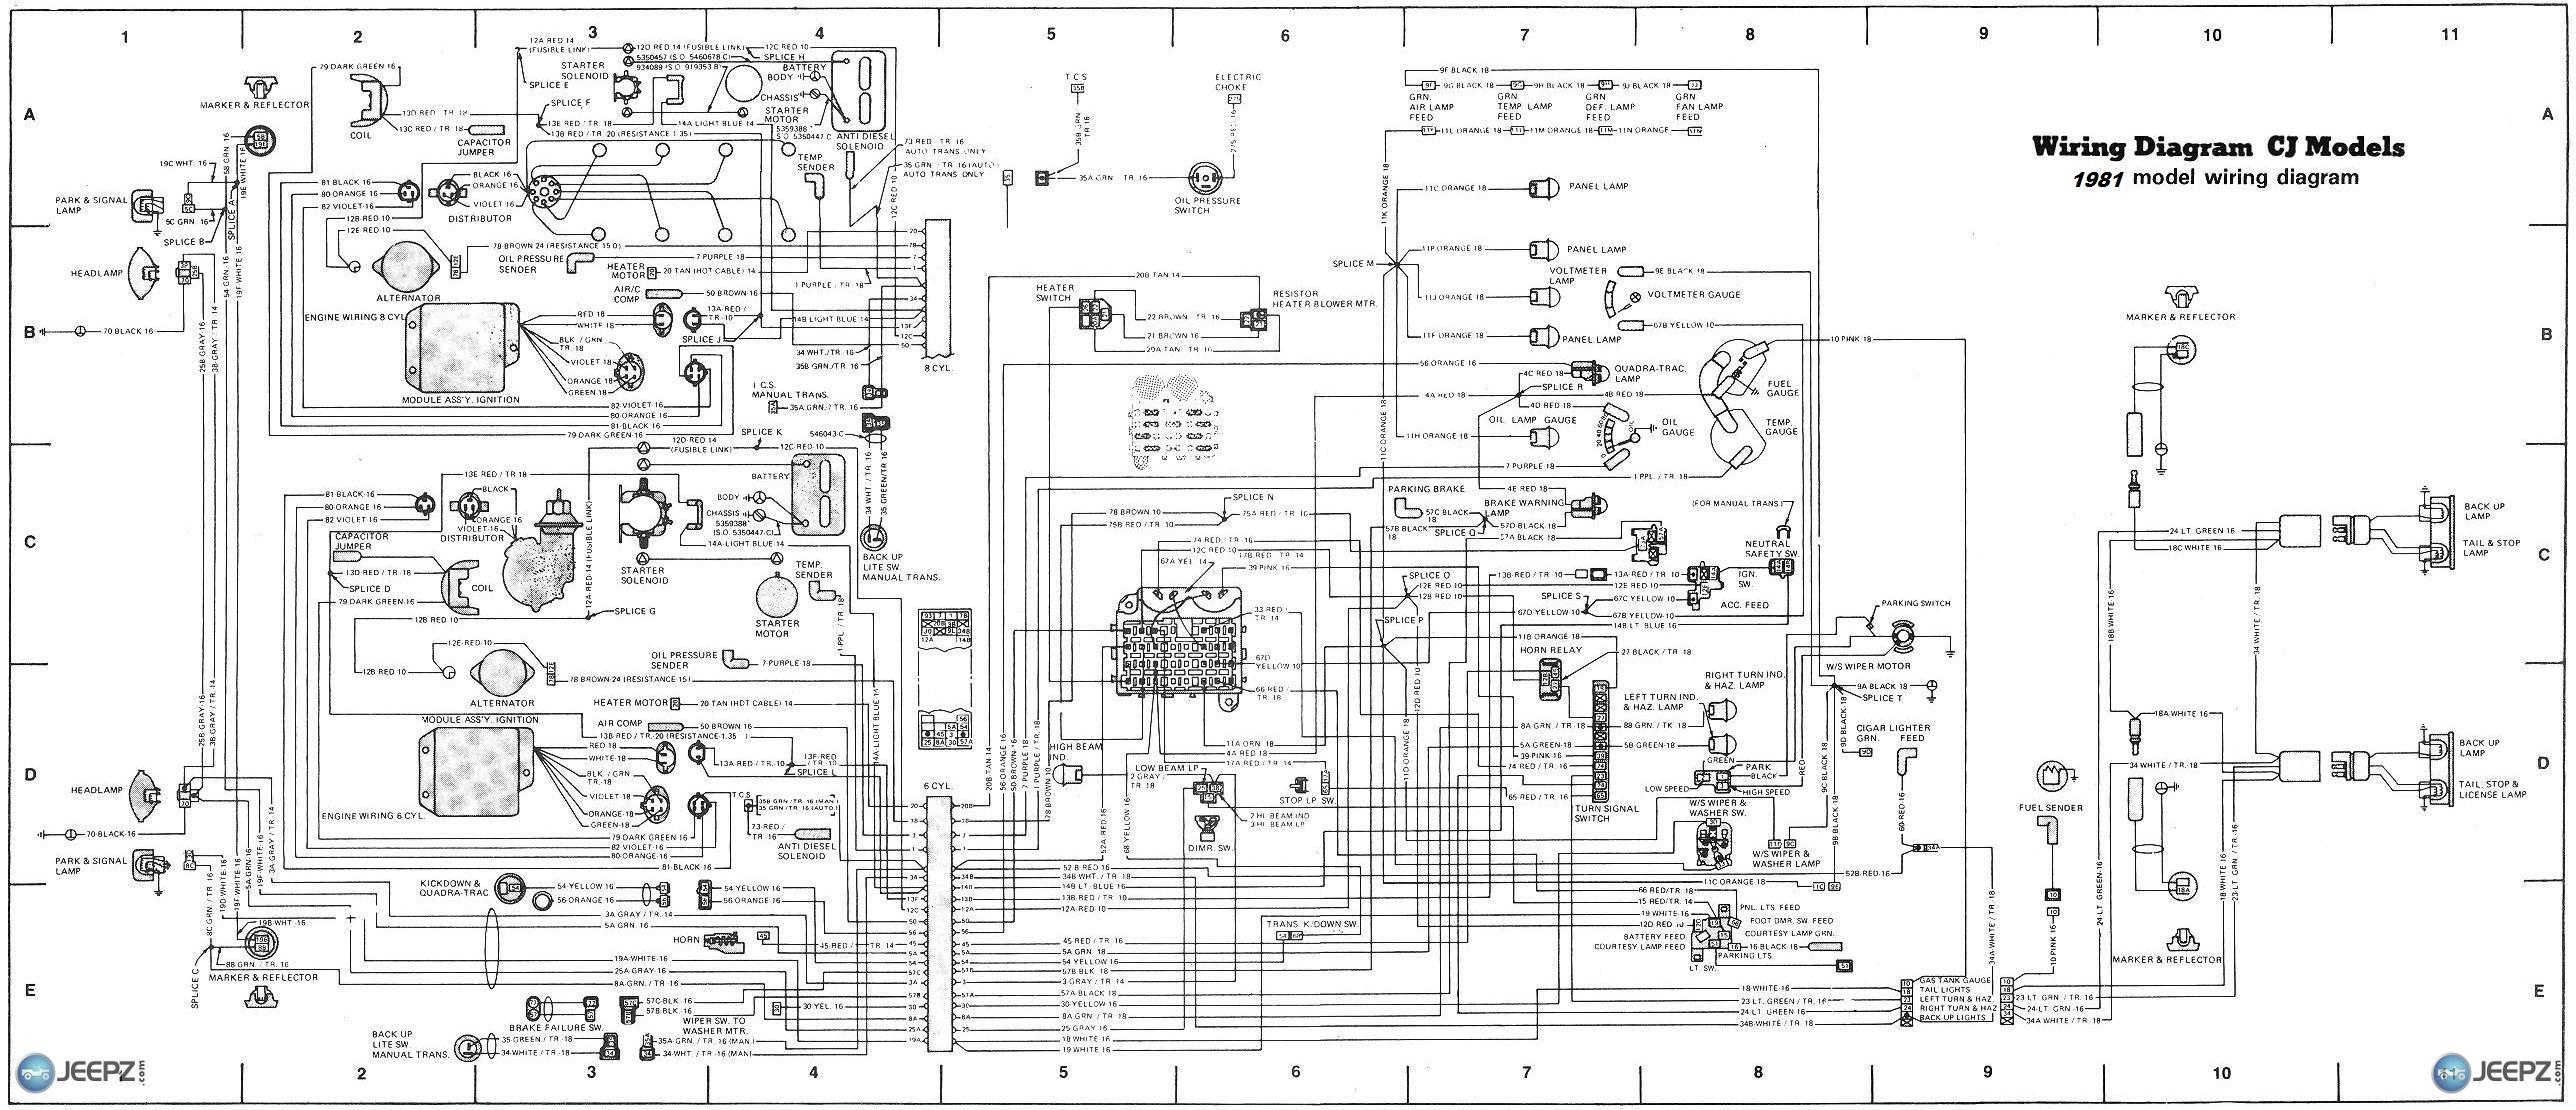 Sensational Cj7 Painless Wiring Diagram Online Wiring Diagram Wiring Cloud Overrenstrafr09Org